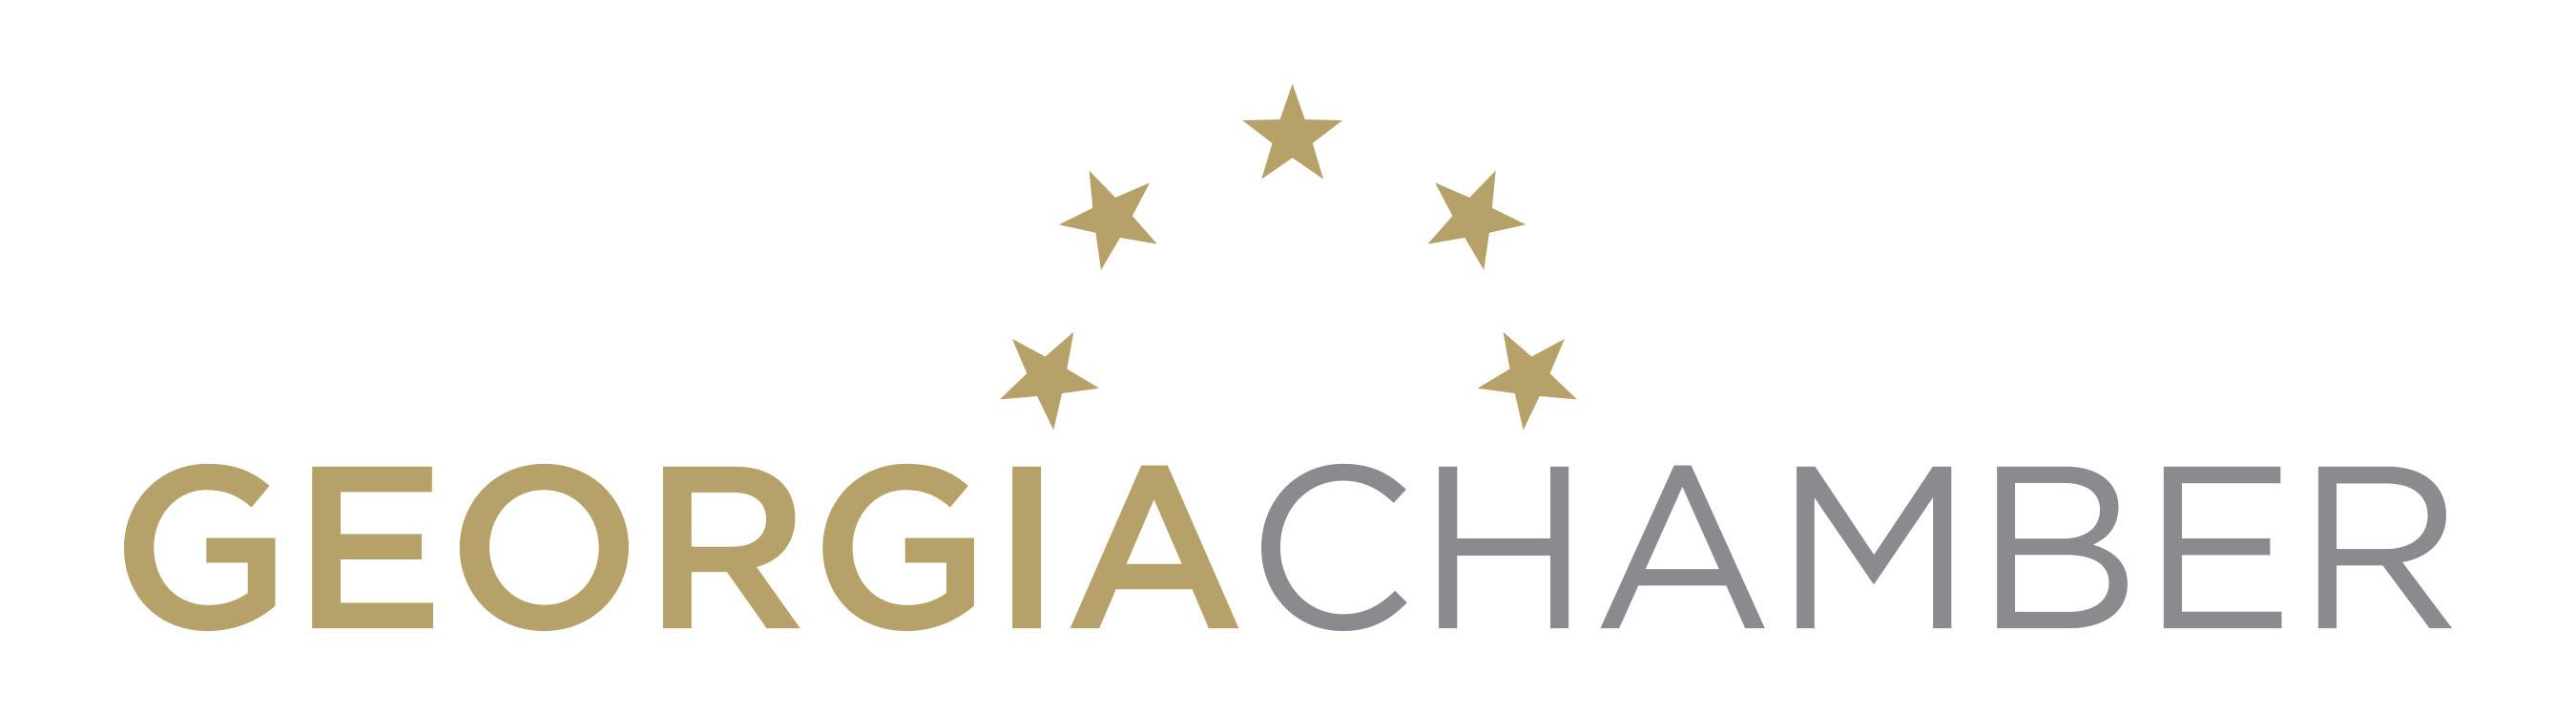 Georgia Chamber SMART Plan - Thomson-McDuffie Chamber of